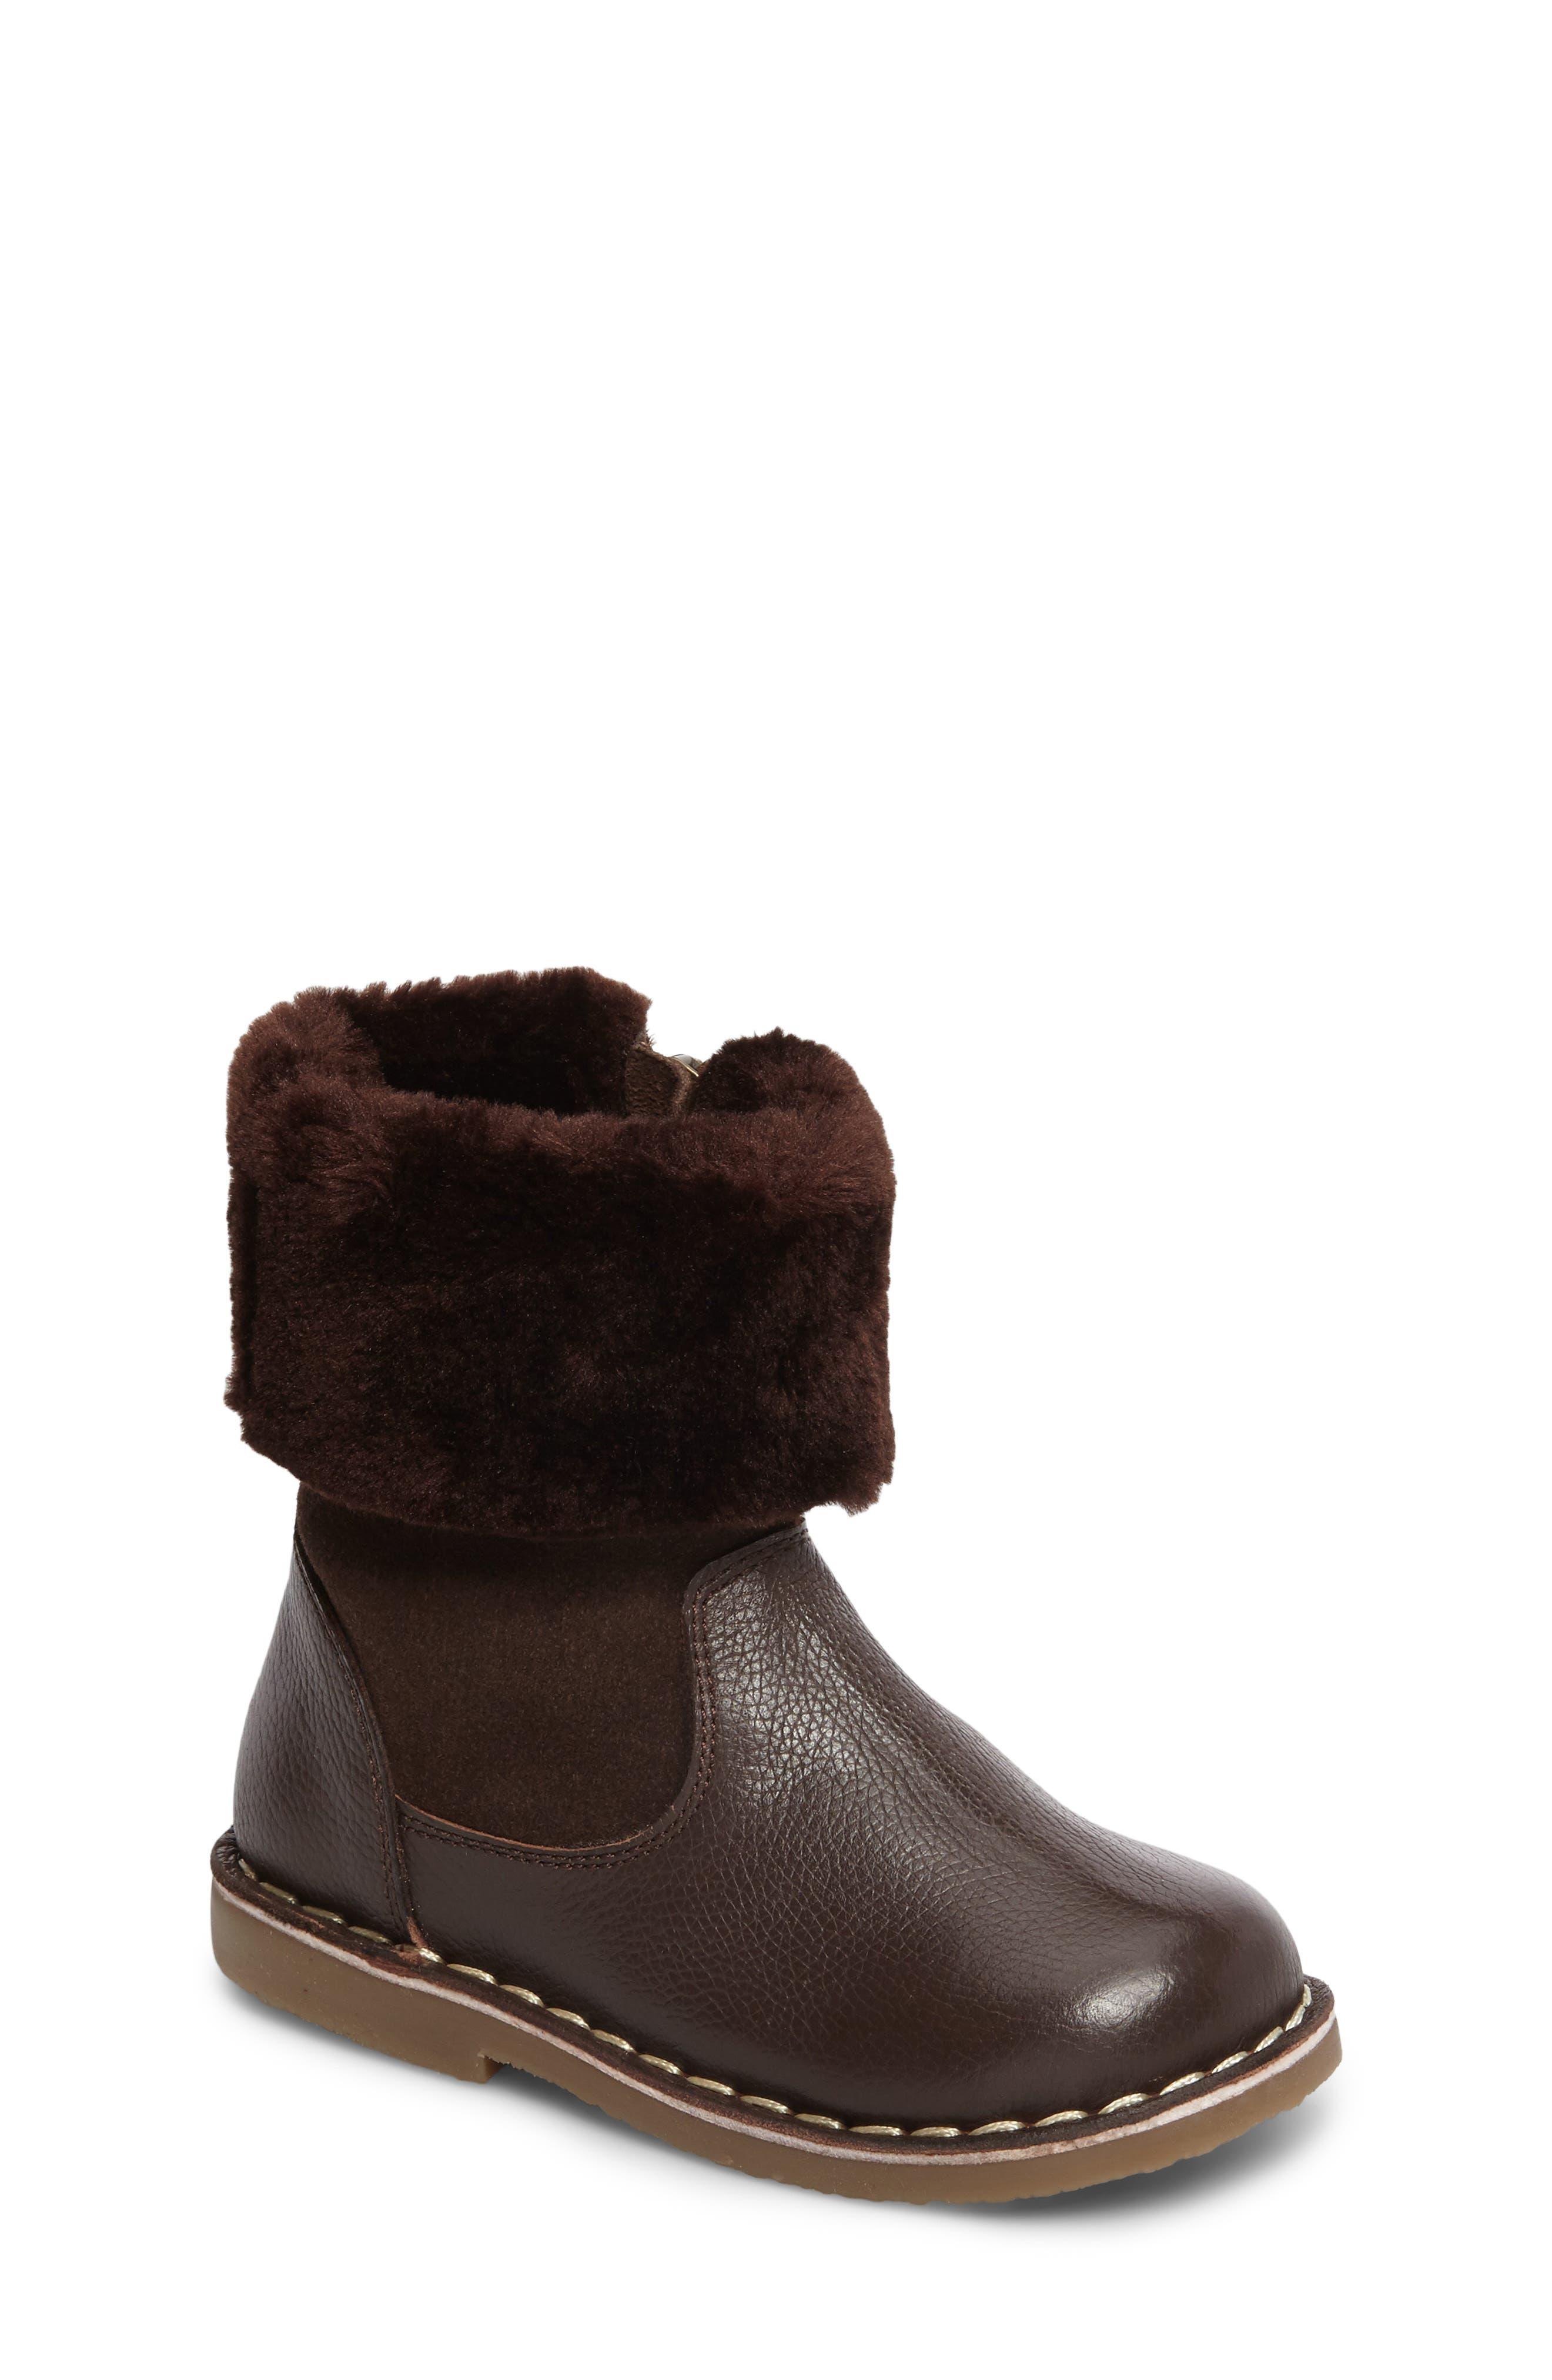 Faux Fur Cuffed Boot,                             Main thumbnail 1, color,                             204